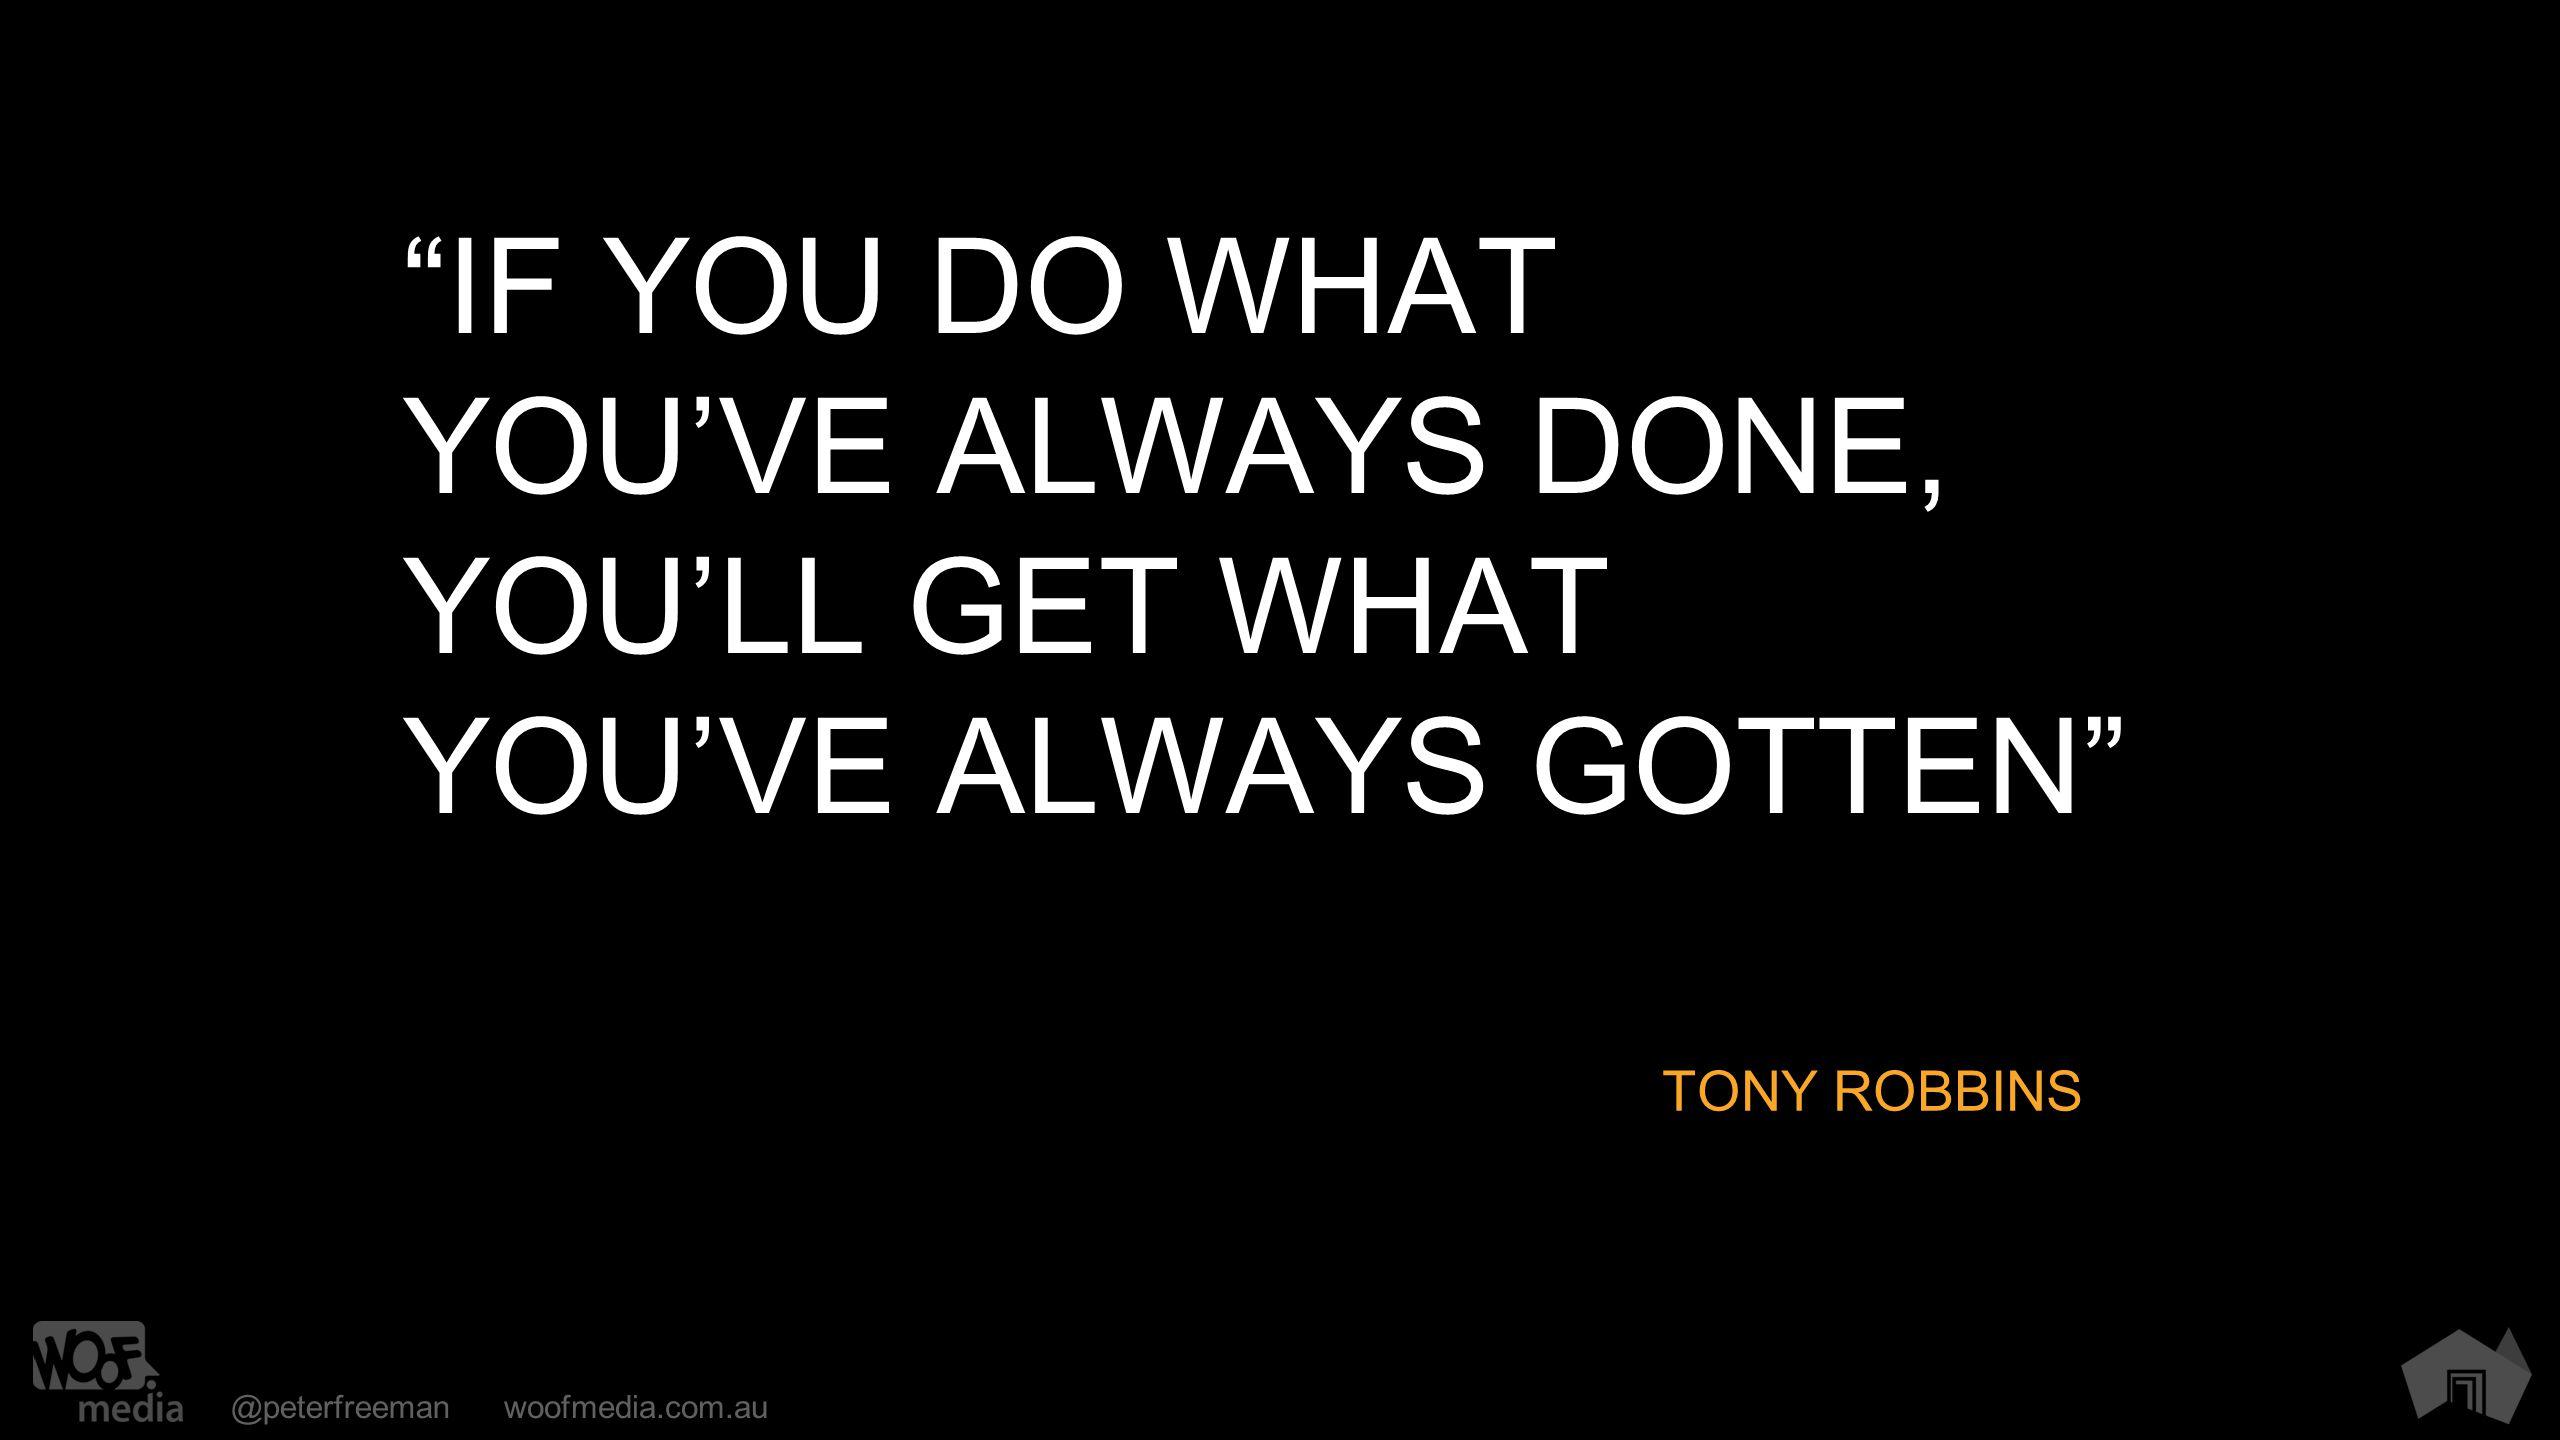 @peterfreemanwoofmedia.com.au IF YOU DO WHAT YOU'VE ALWAYS DONE, YOU'LL GET WHAT YOU'VE ALWAYS GOTTEN TONY ROBBINS